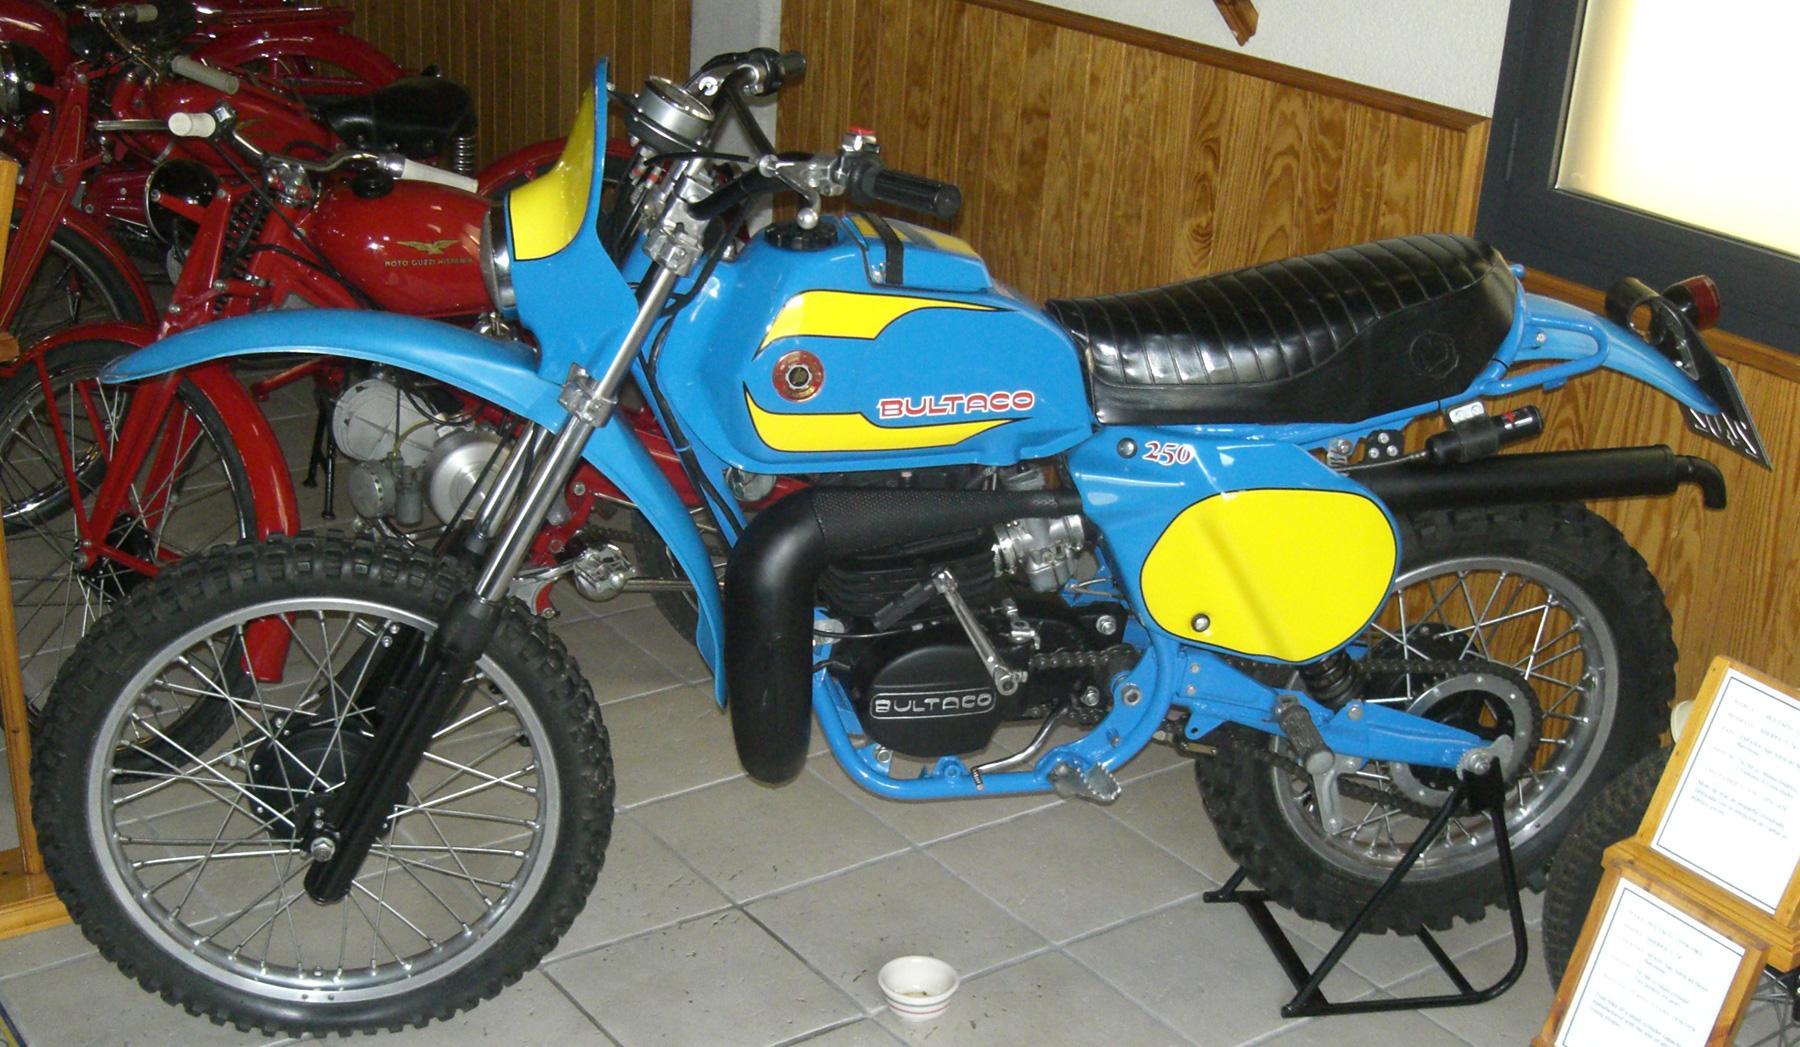 Bultaco Frontera Prednisone And Clonazepam 痞客邦